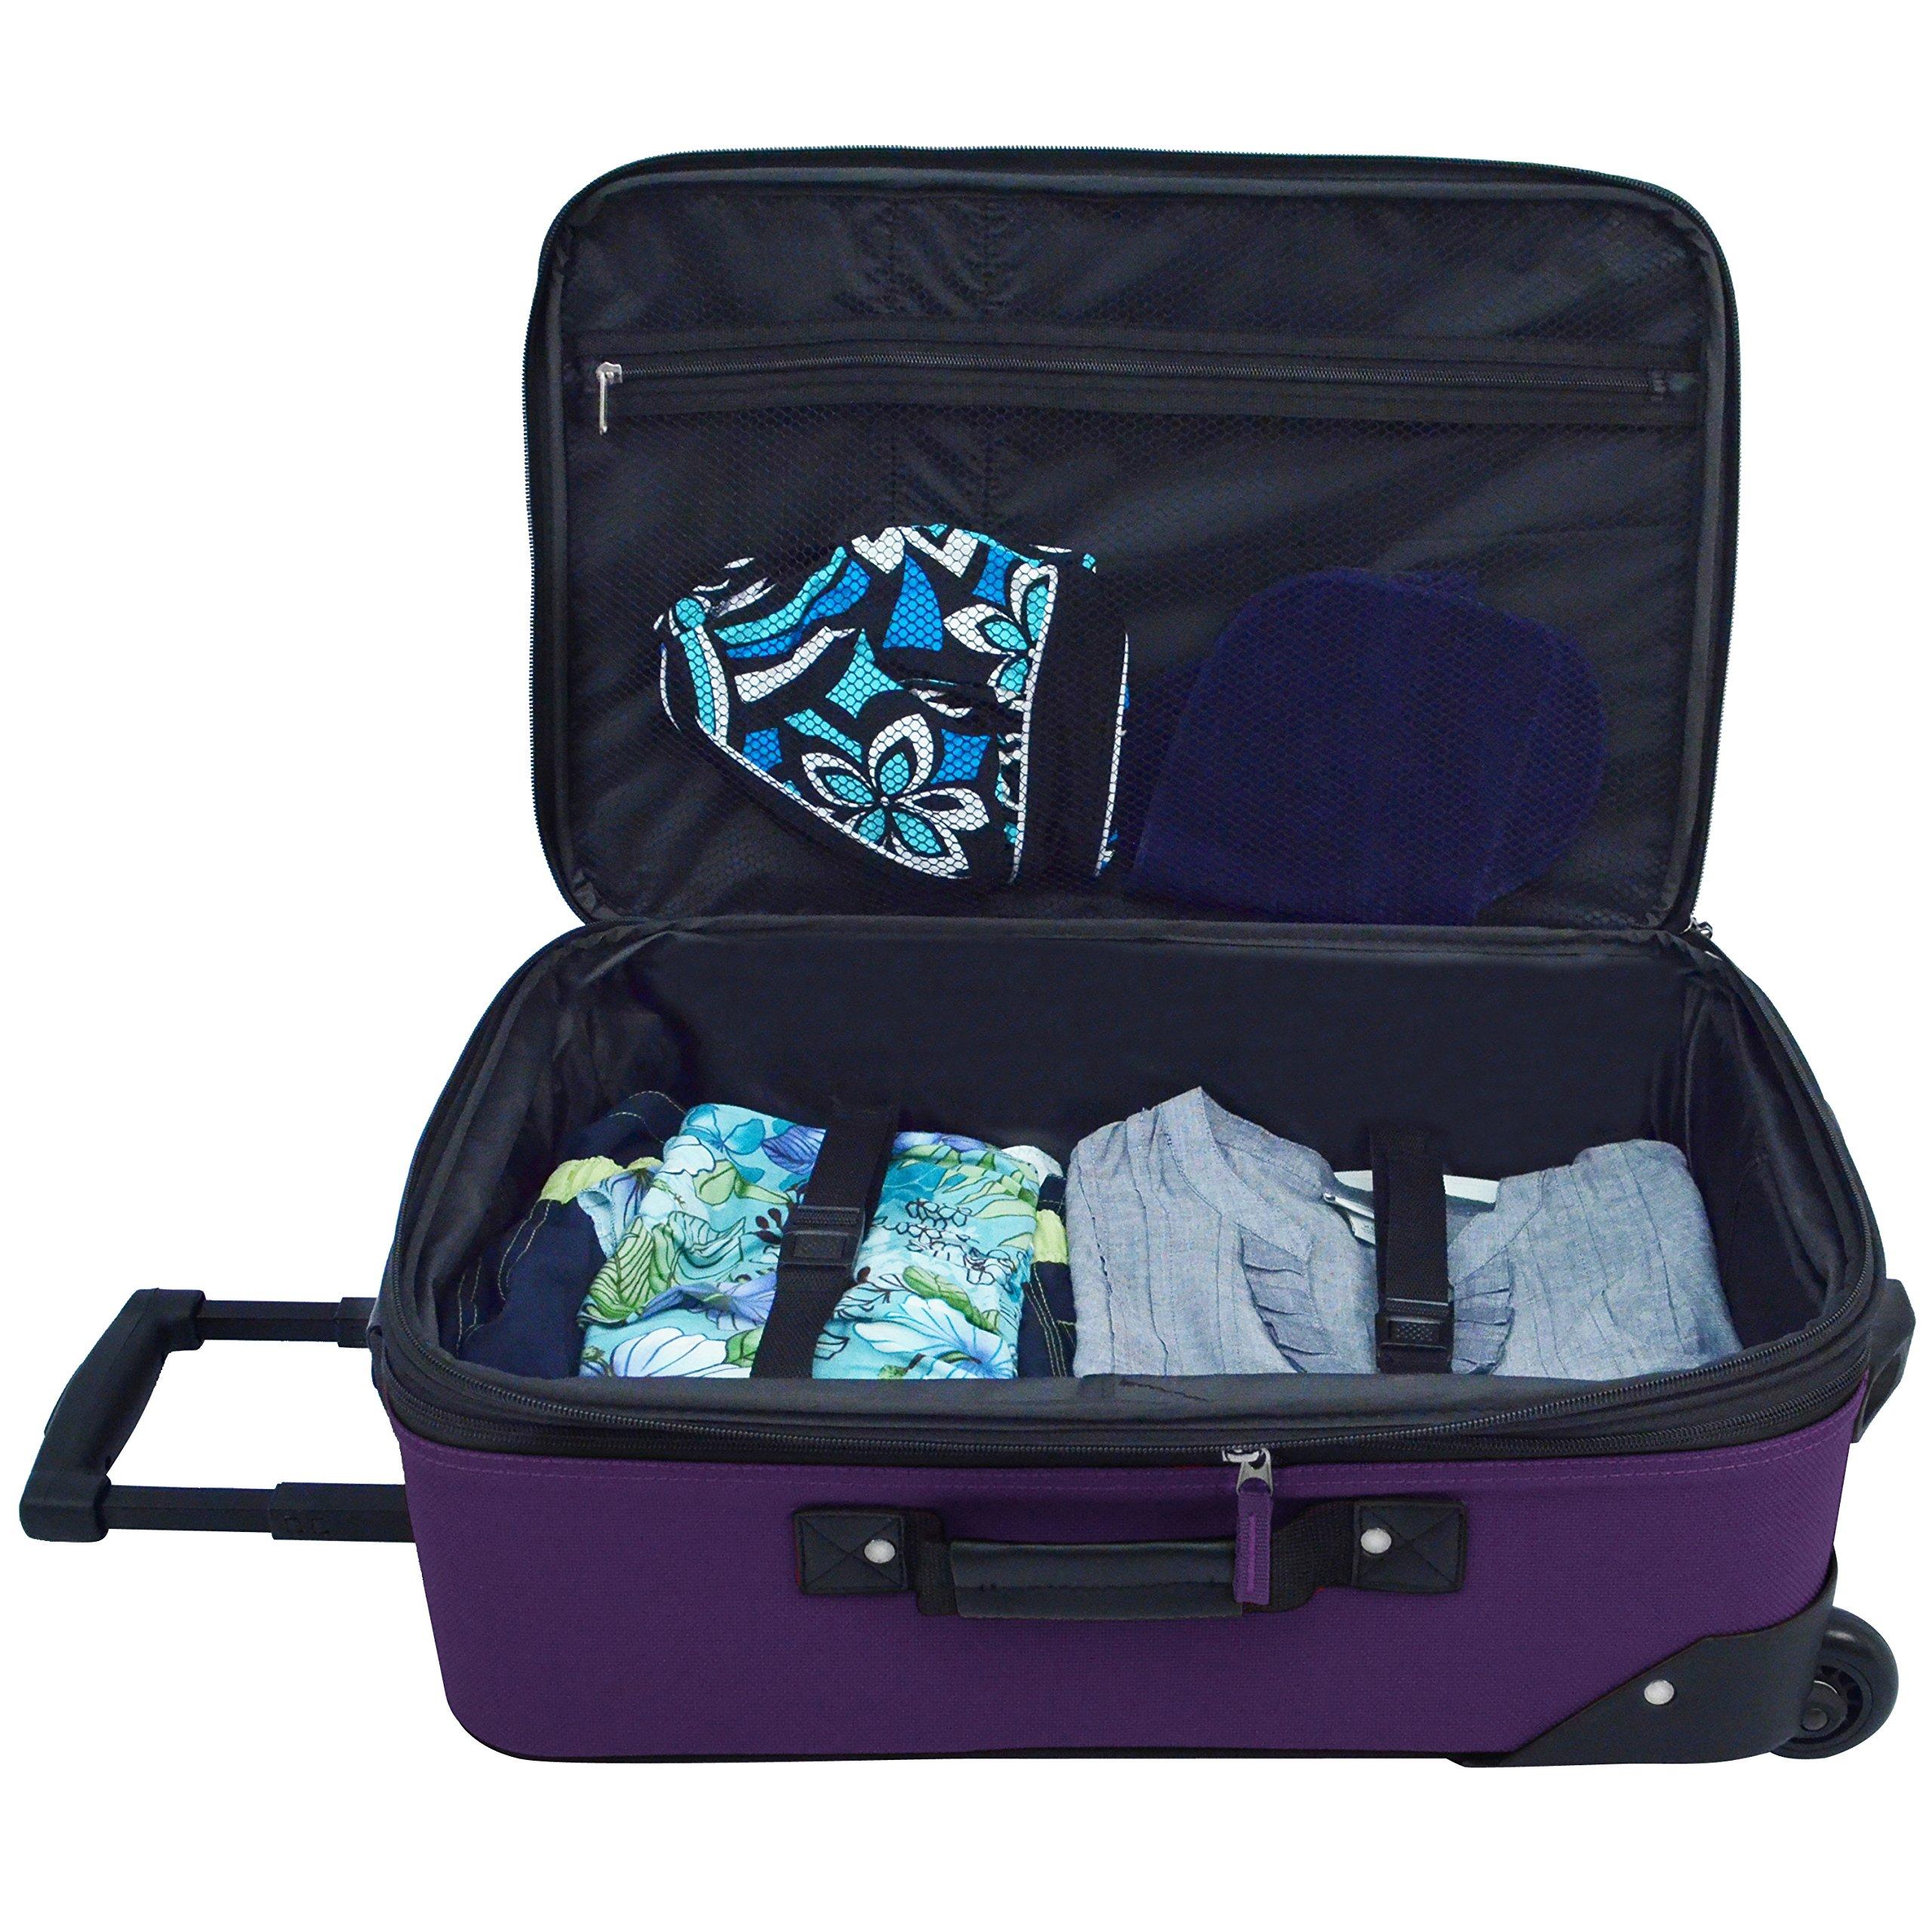 U.S. Traveler Rio 2-Piece Expandable Carry-On Luggage Set, Purple by U.S. Traveler